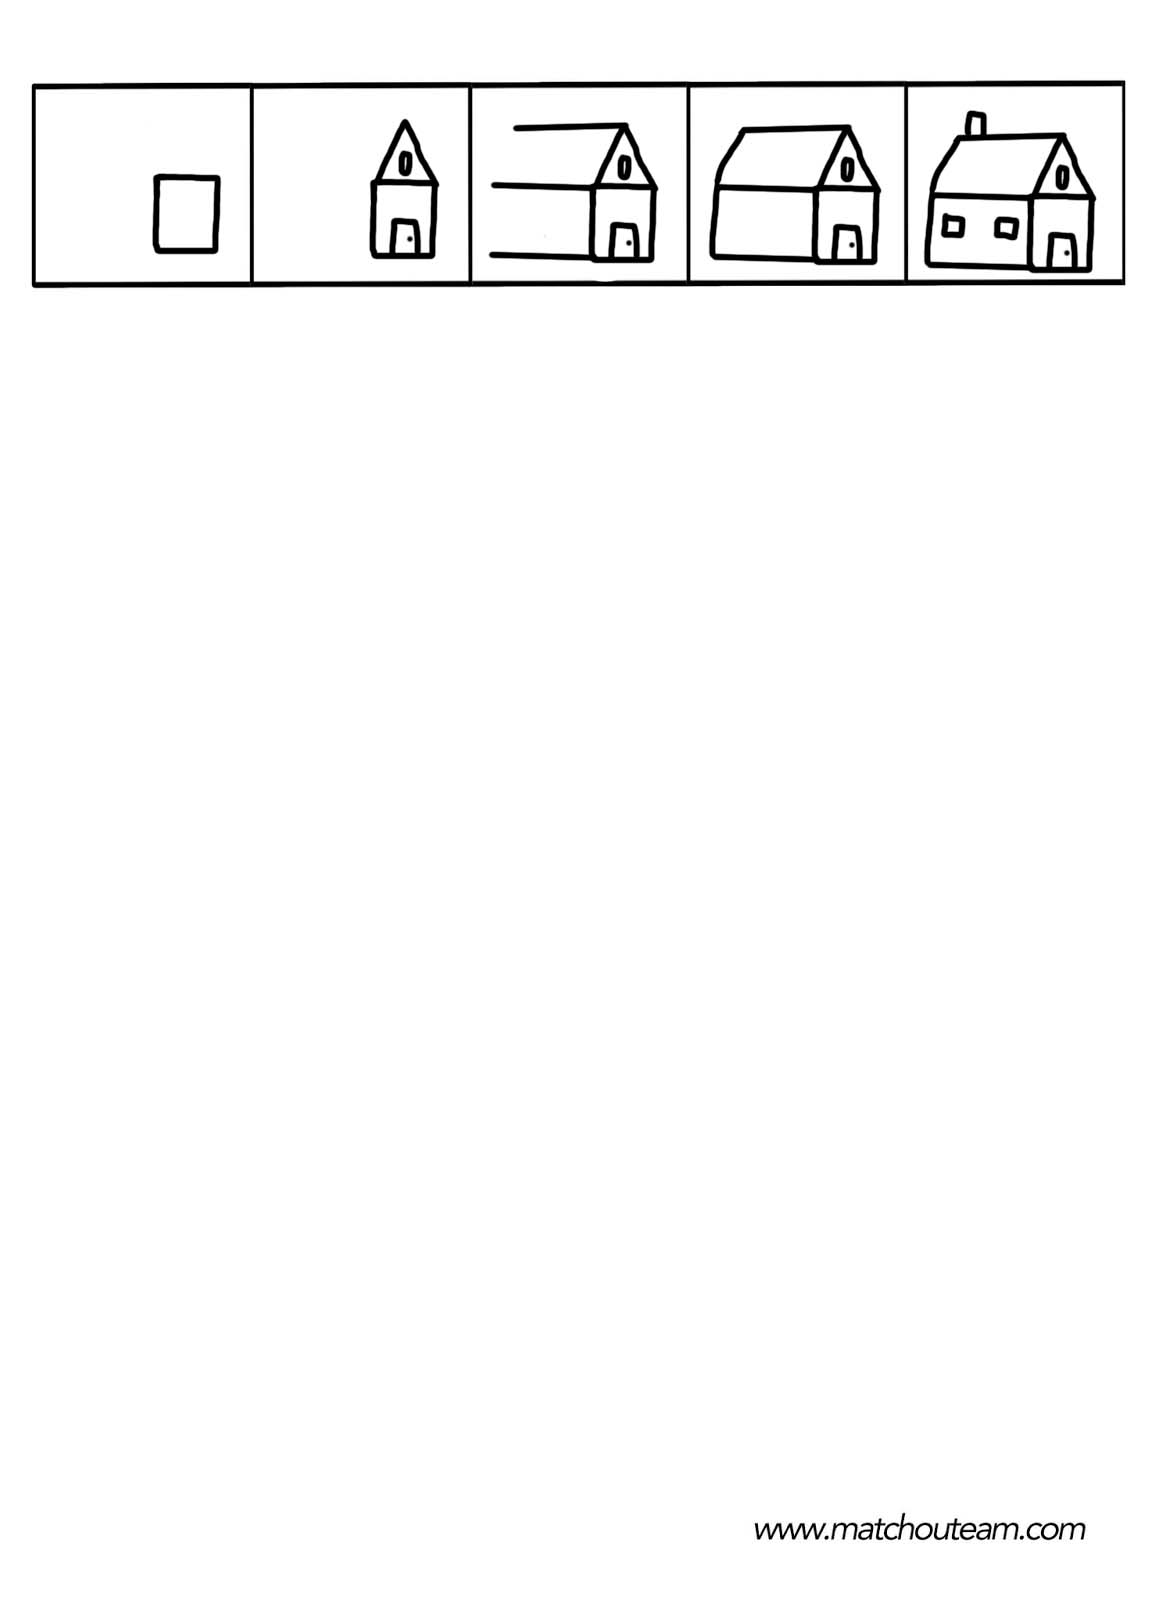 maison dessin dirigé